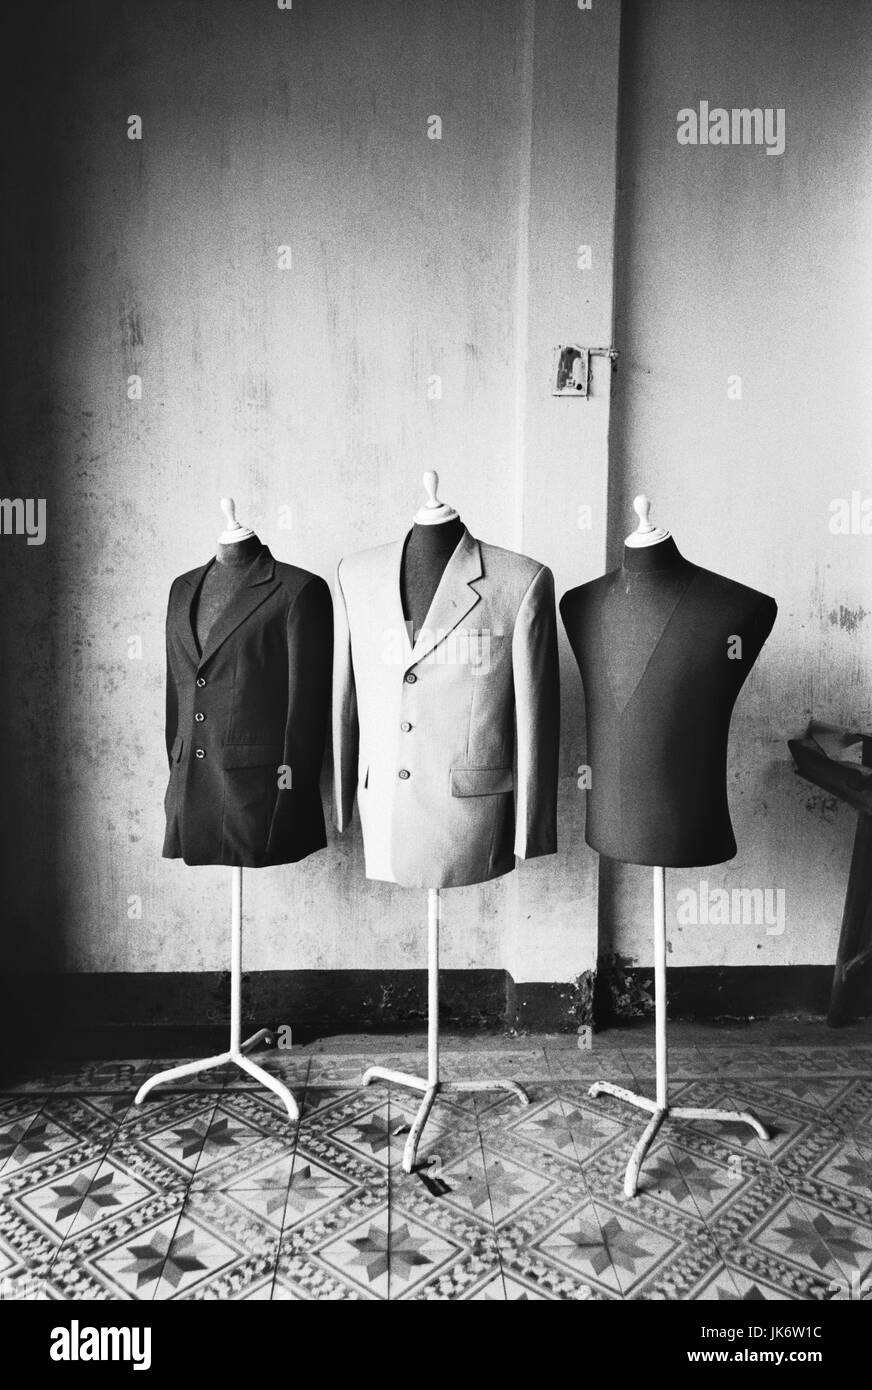 Vietnam, Hoi An, Boutique,  Kleiderpuppen, Jackets, s/w  innen, Südostasien, Hinterindien, Tongkingdelta, Stadt, - Stock Image